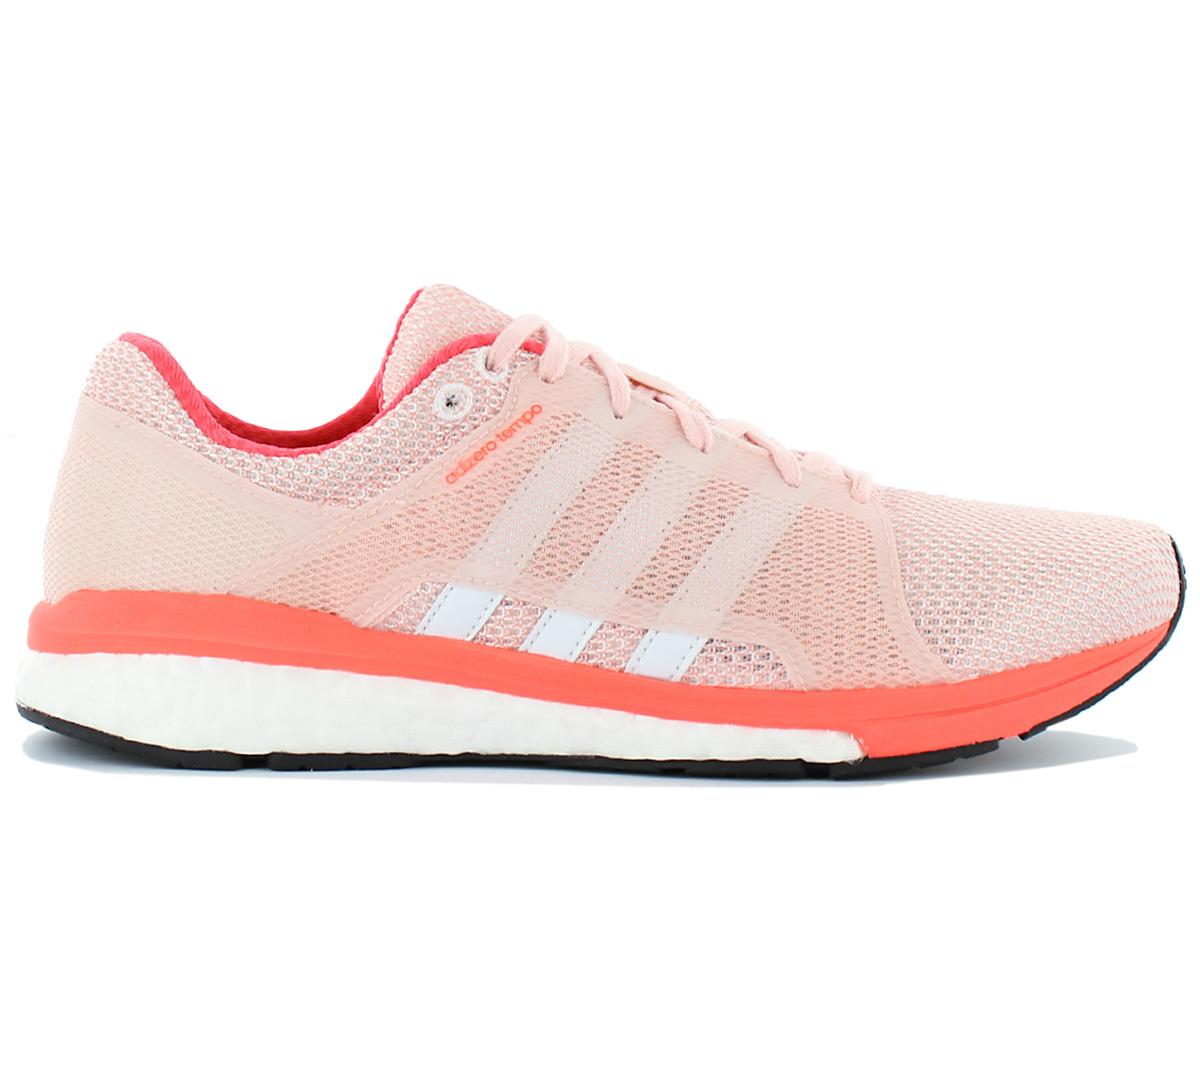 adidas Adizero Tempo 8 SSF W Boost Damen Laufschuhe Running Schuhe AQ6112 NEU